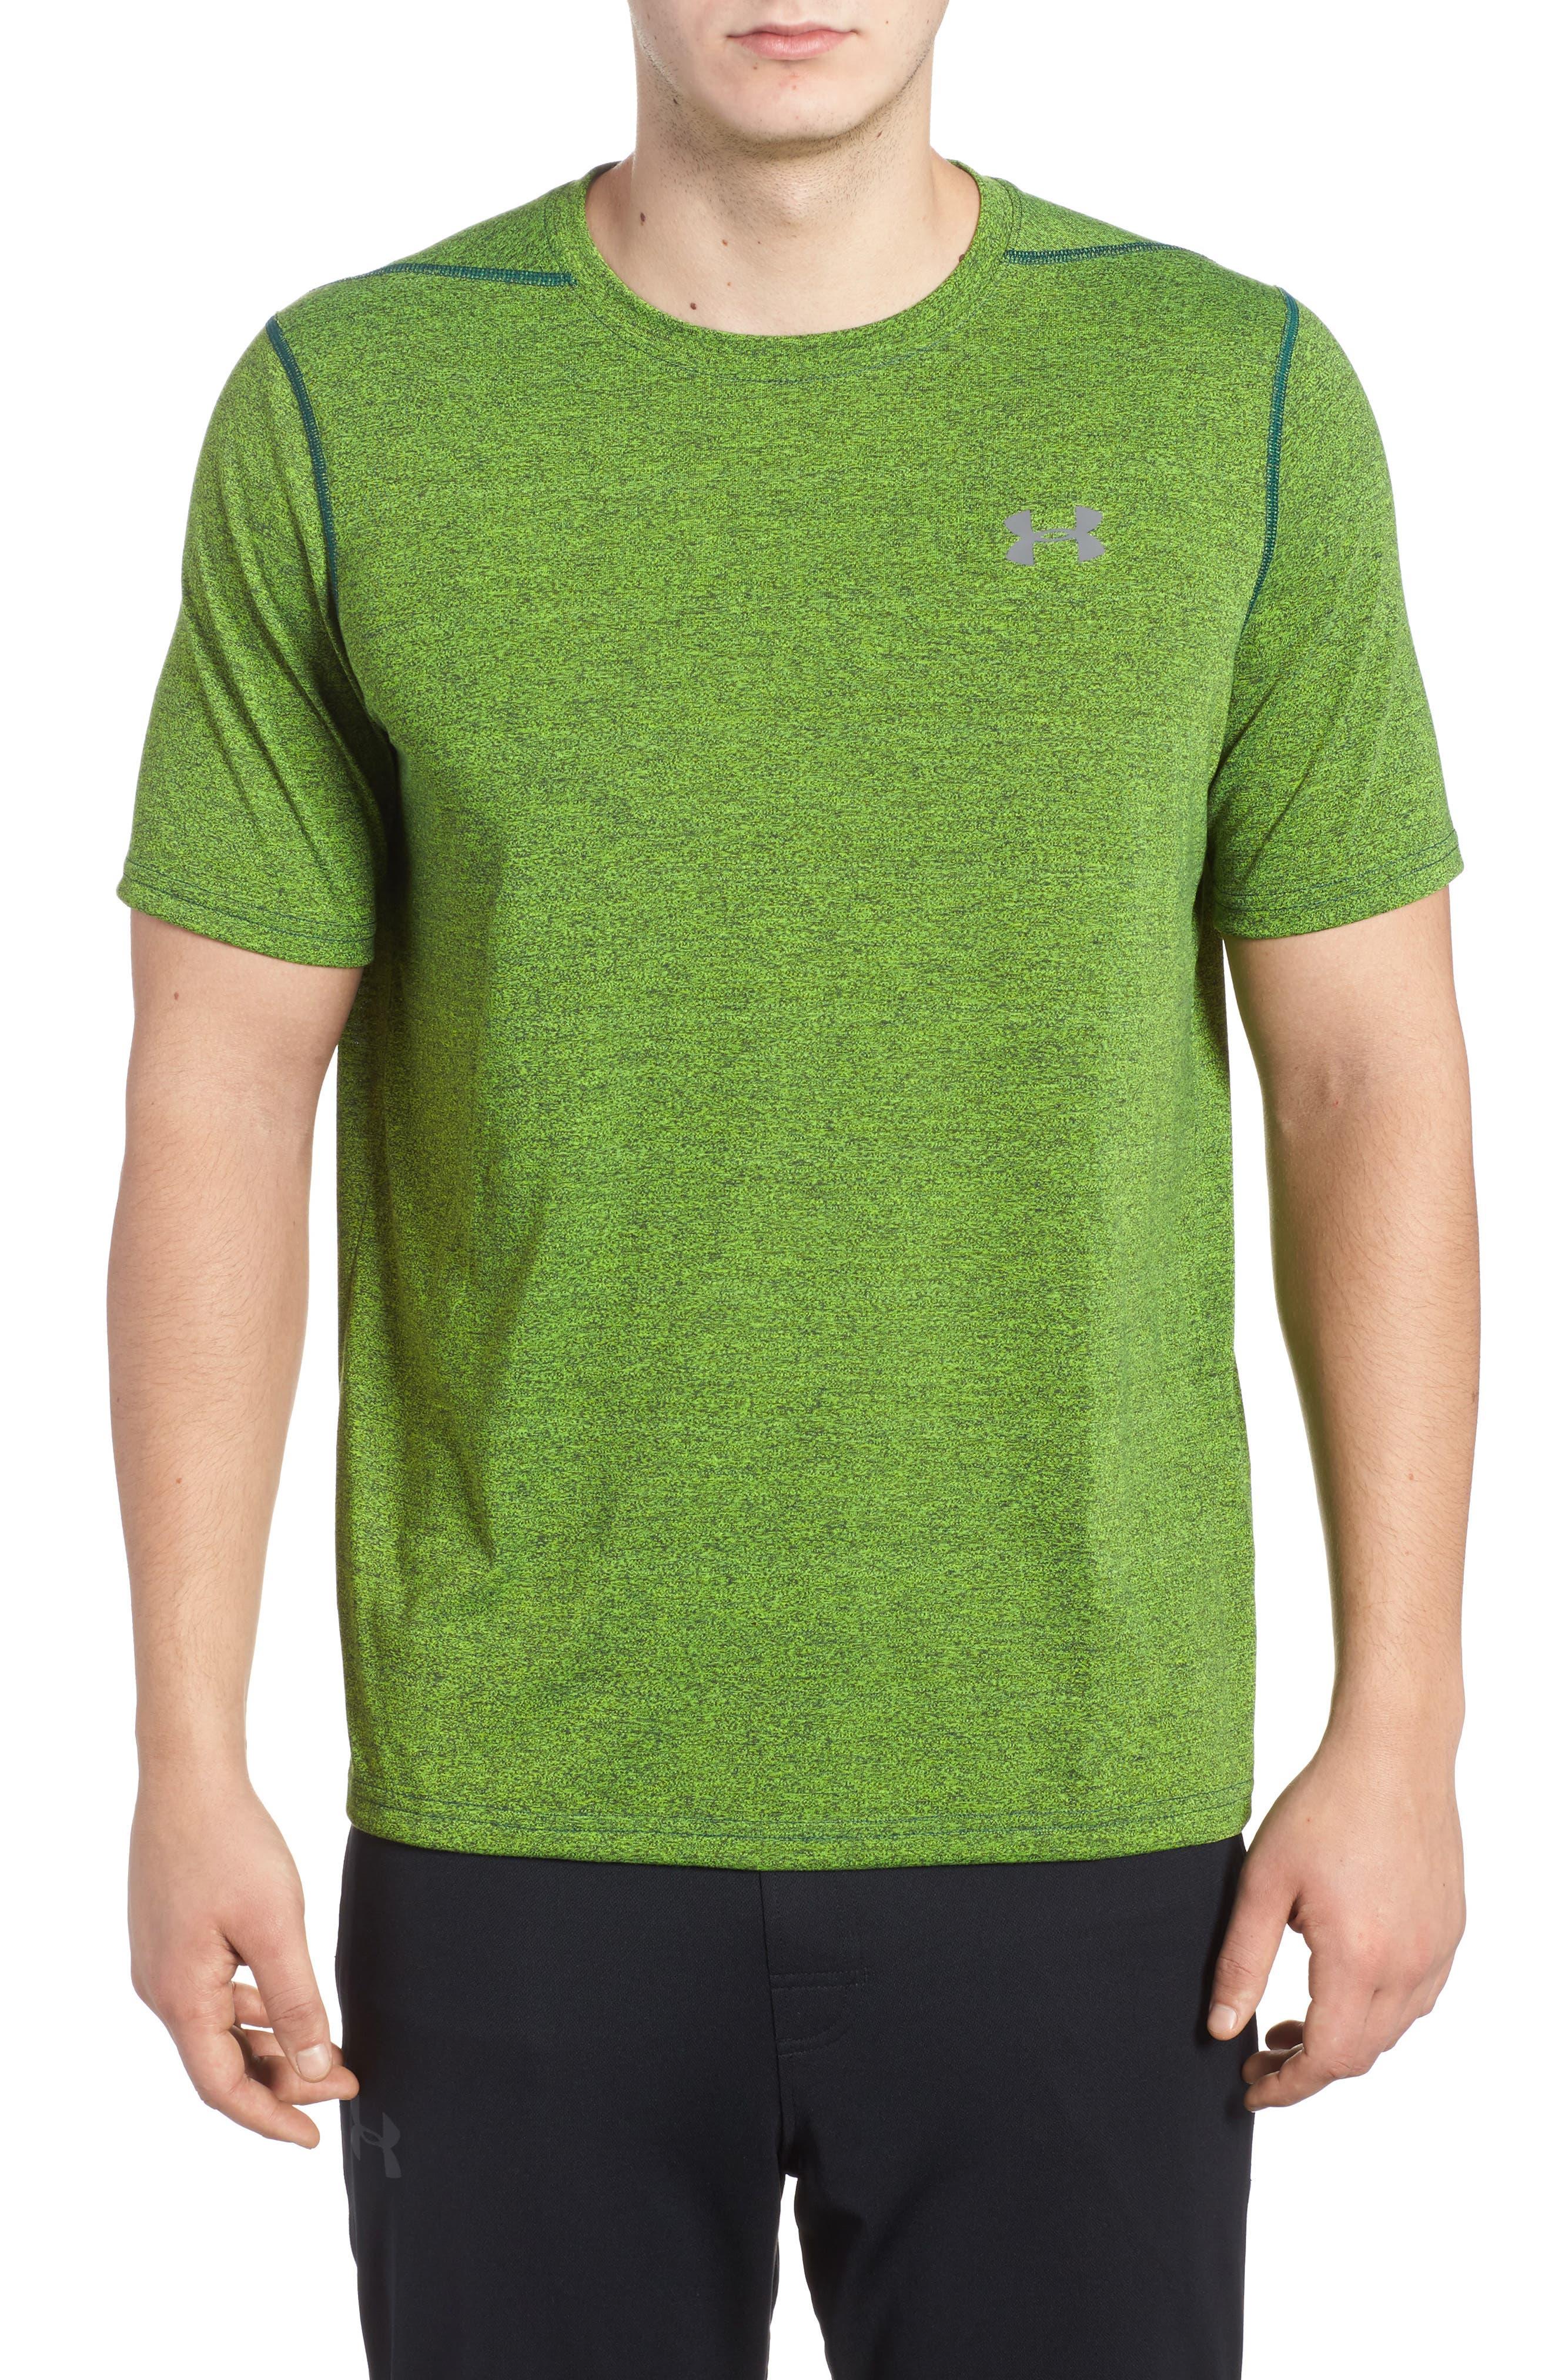 Threadborne Siro 3C Twist T-Shirt,                             Main thumbnail 1, color,                             300